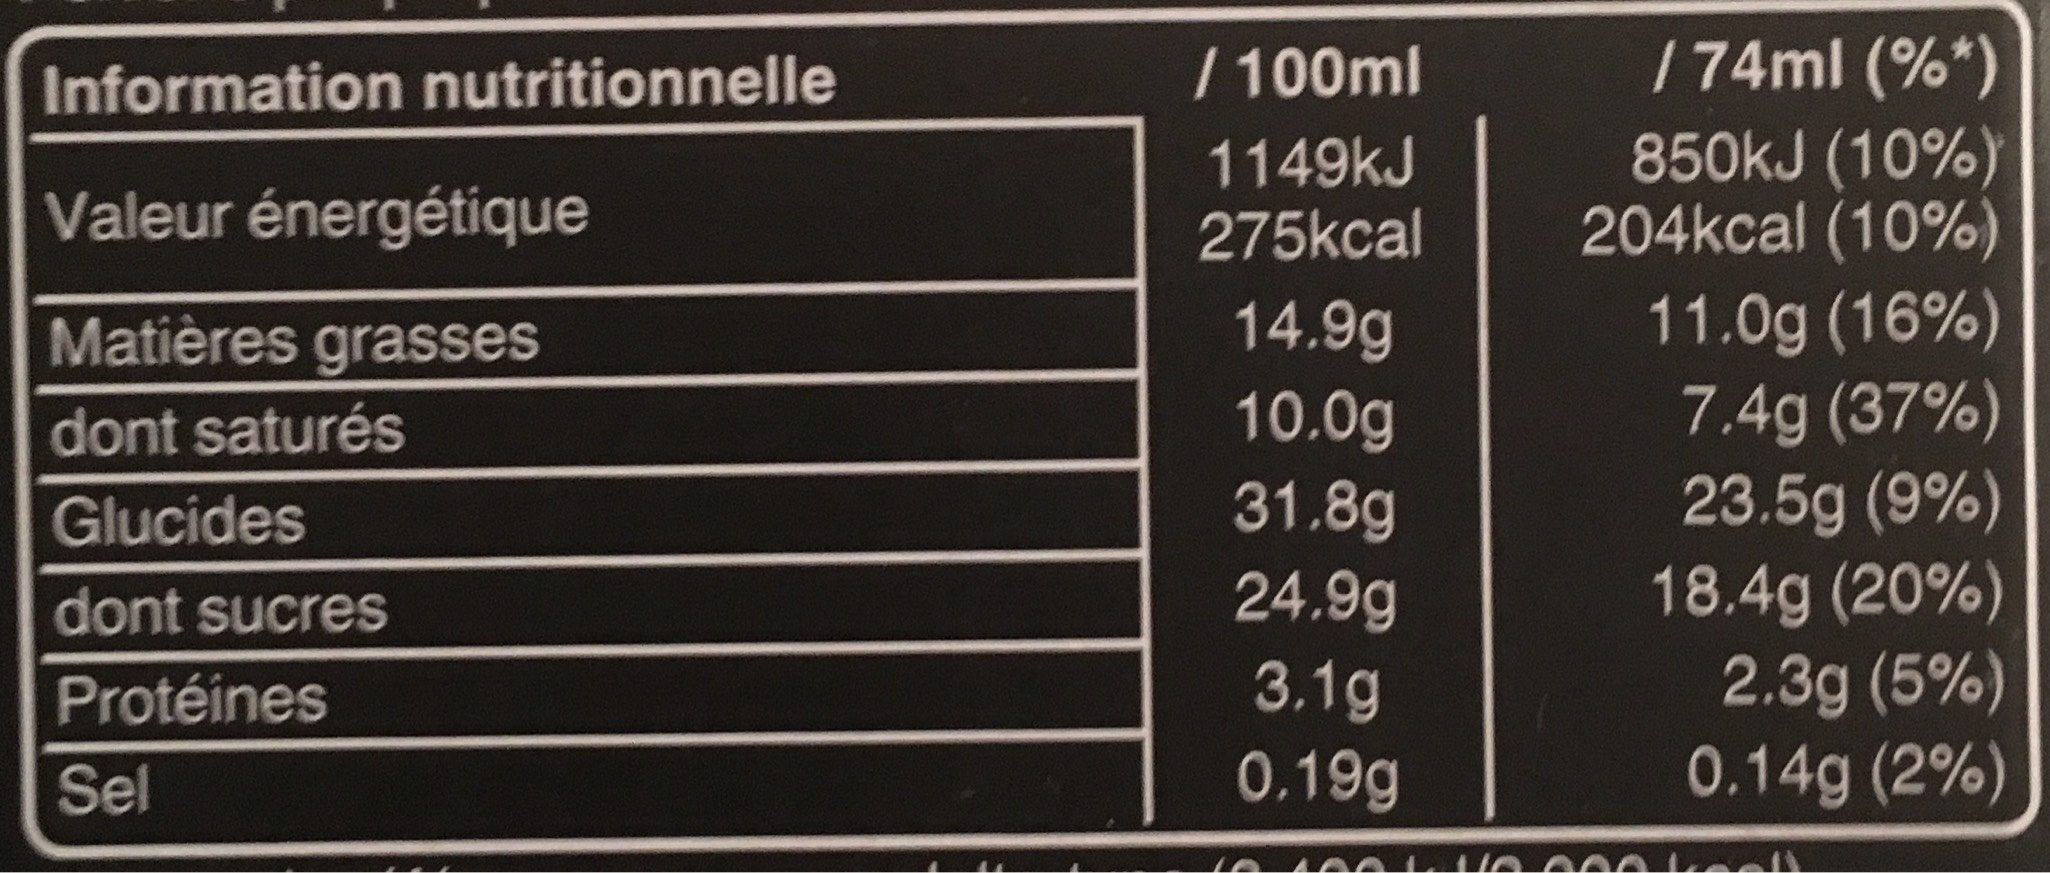 Maxi Barres - Informations nutritionnelles - fr